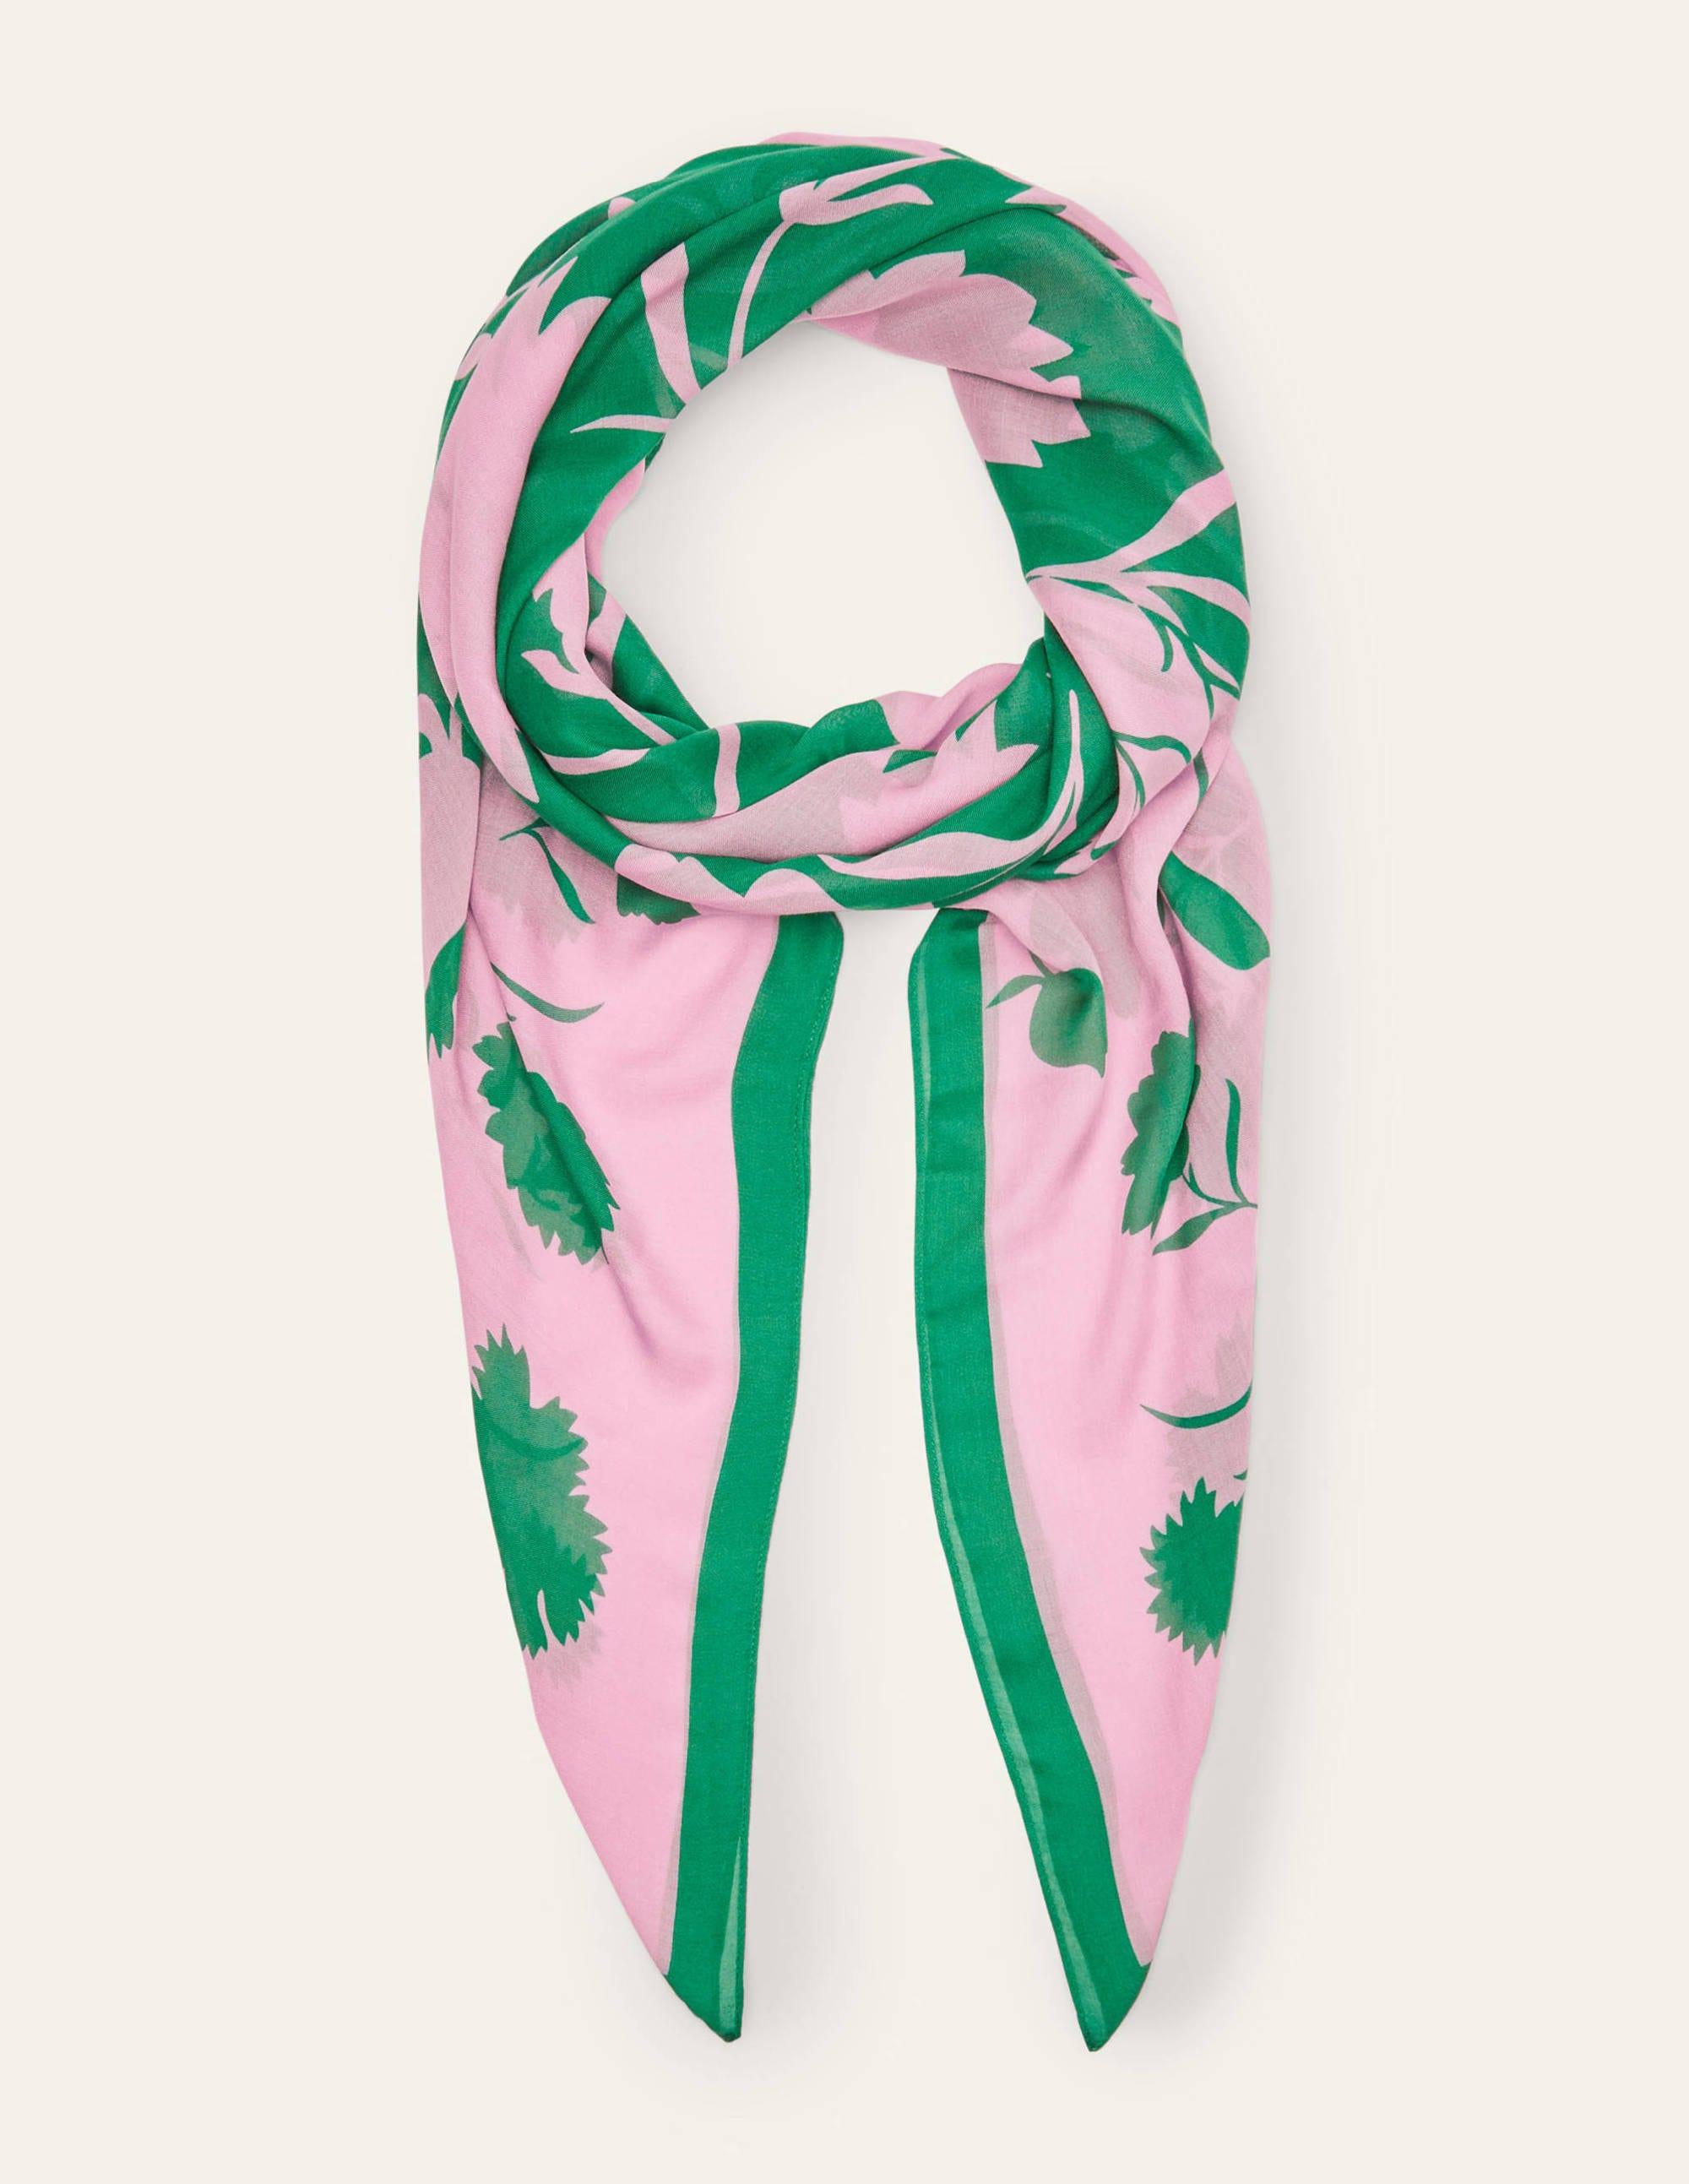 Foulard imprimé MGR Boden Boden, Pink